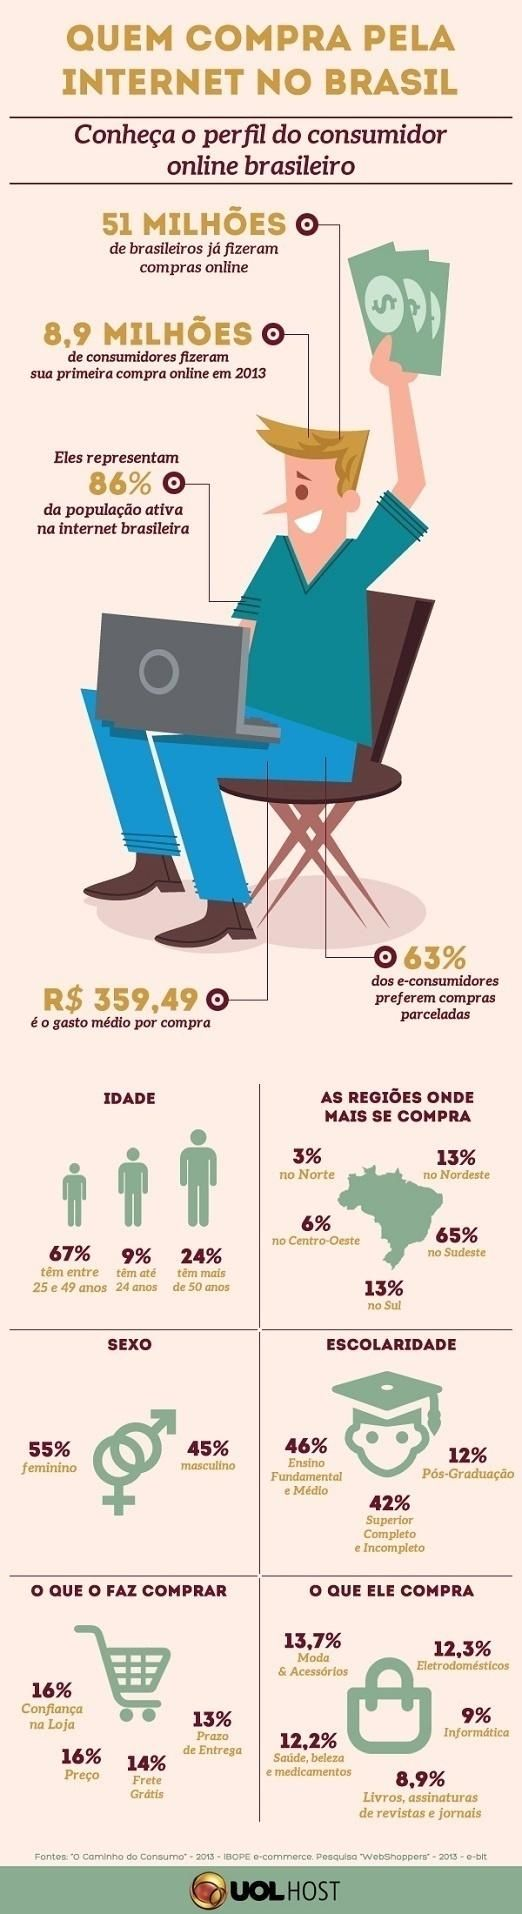 Perfil do consumidor brasileiro na internet #ecommerce #Brasil